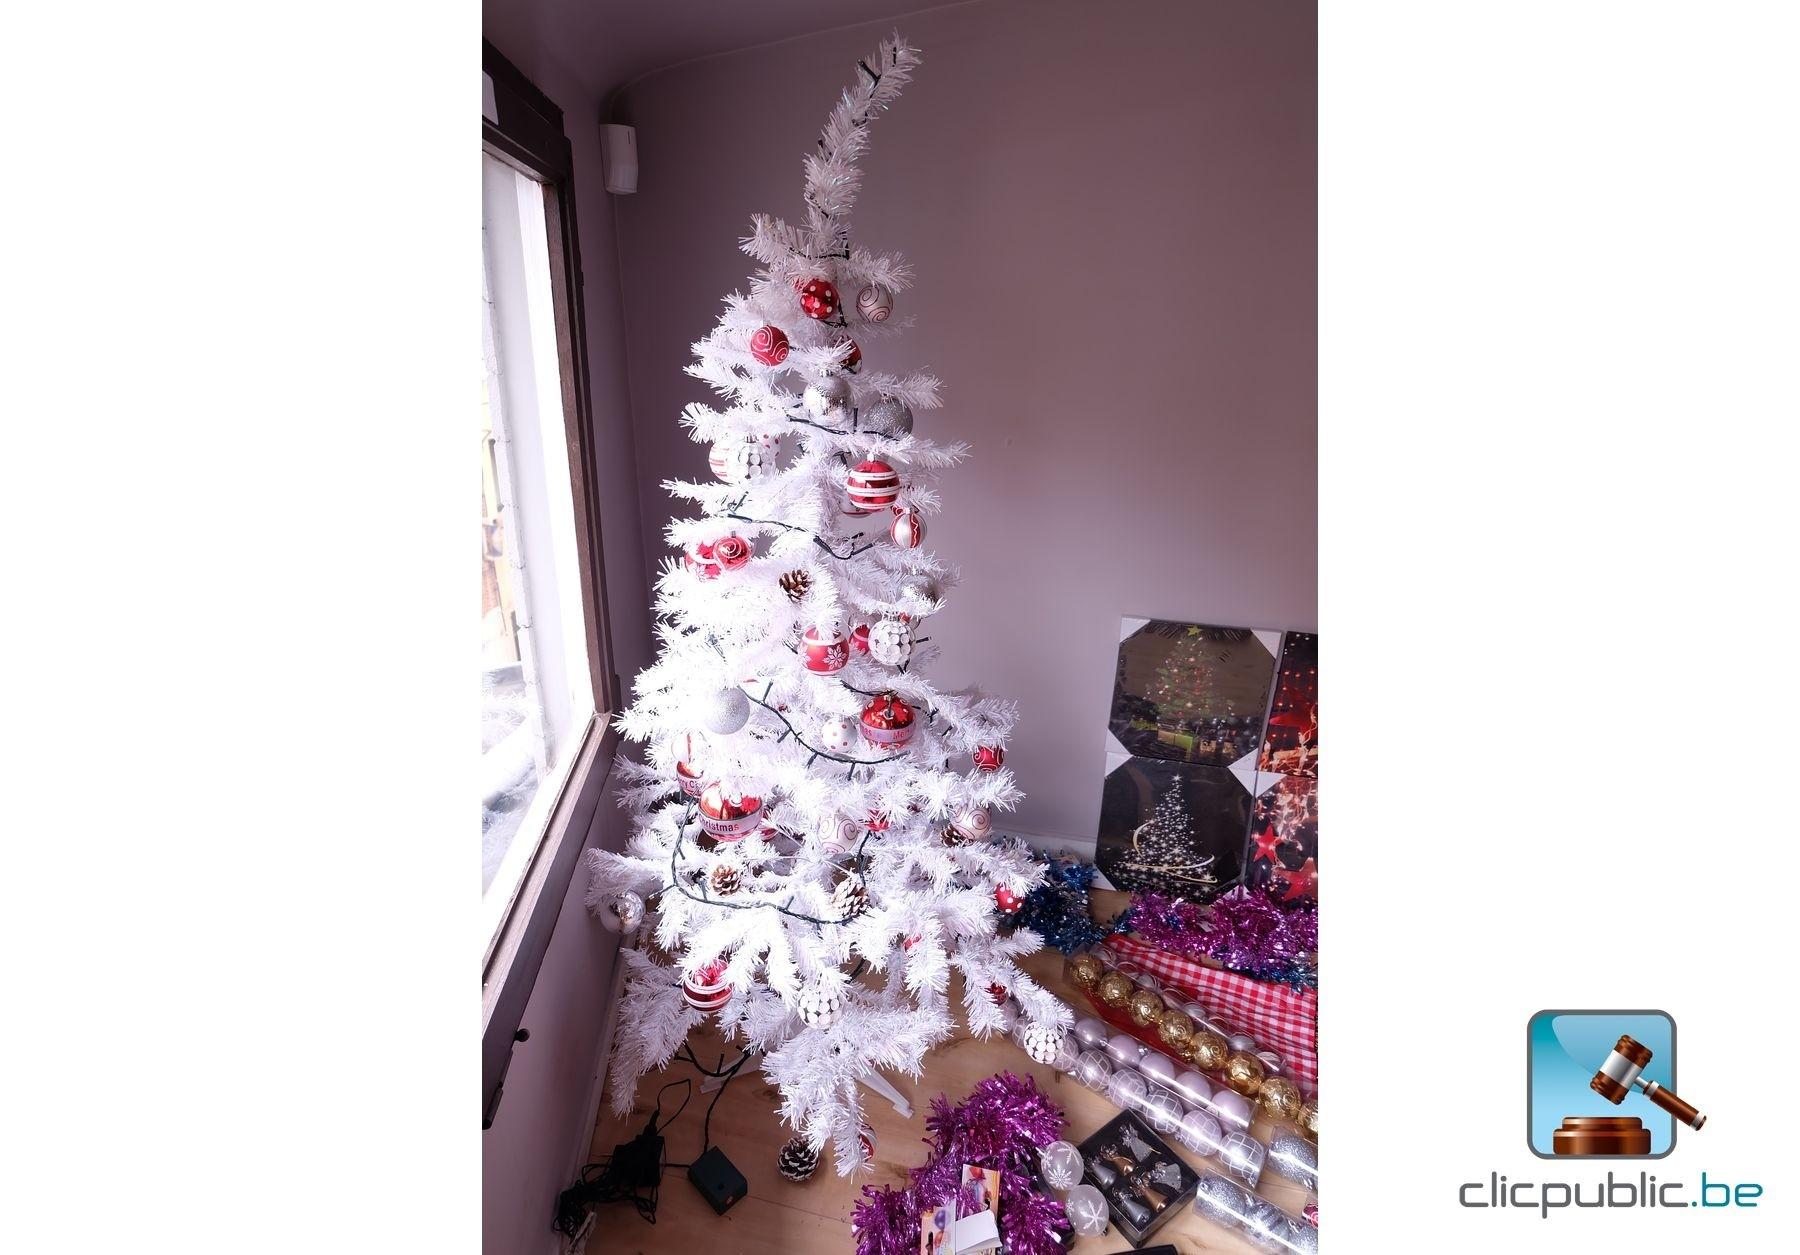 #2A7EA1 Décorations De Noël (ref. 6) à Vendre Sur Clicpublic.be 5319 decorations de noel a vendre 1800x1255 px @ aertt.com